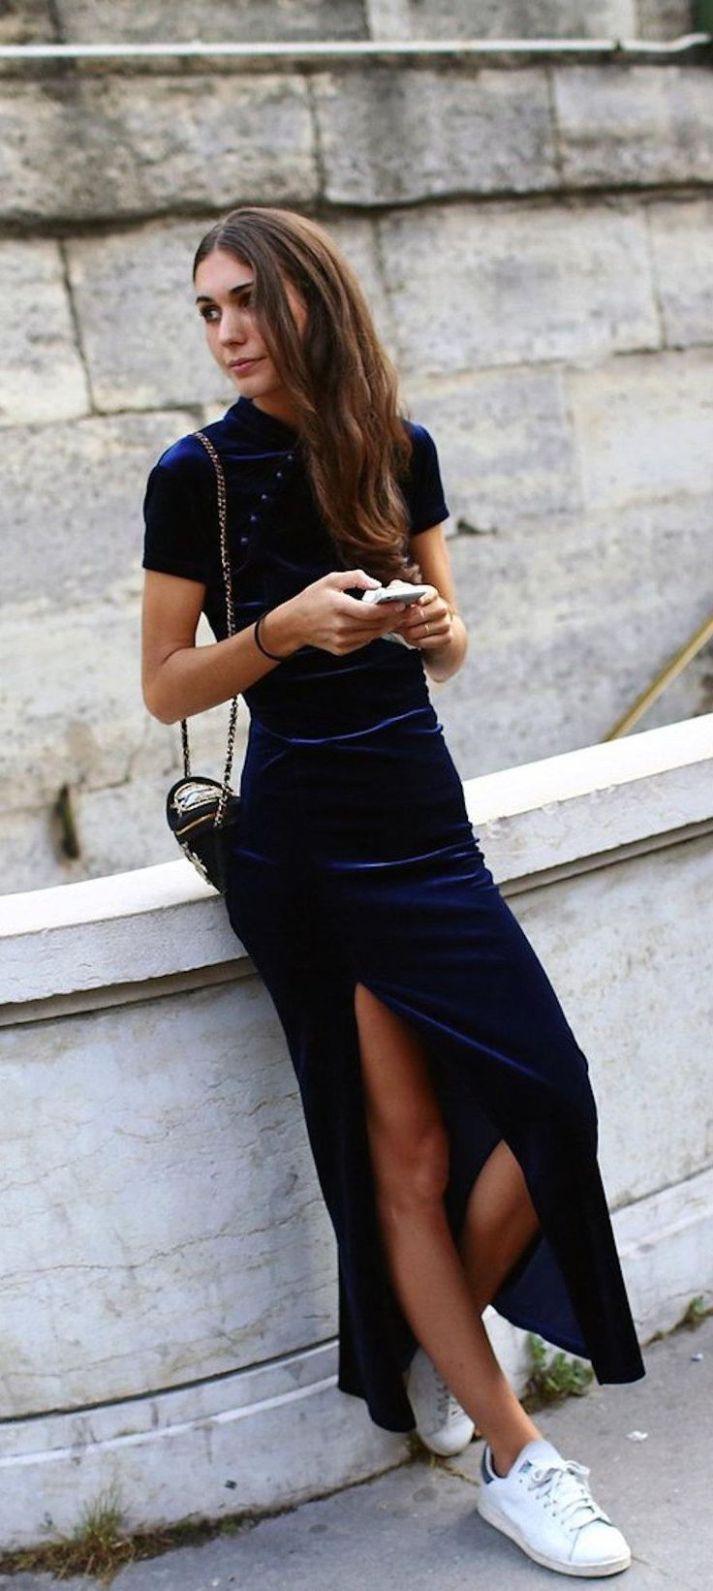 The 25+ best Velvet outfit ideas ideas on Pinterest | Bodycon ...